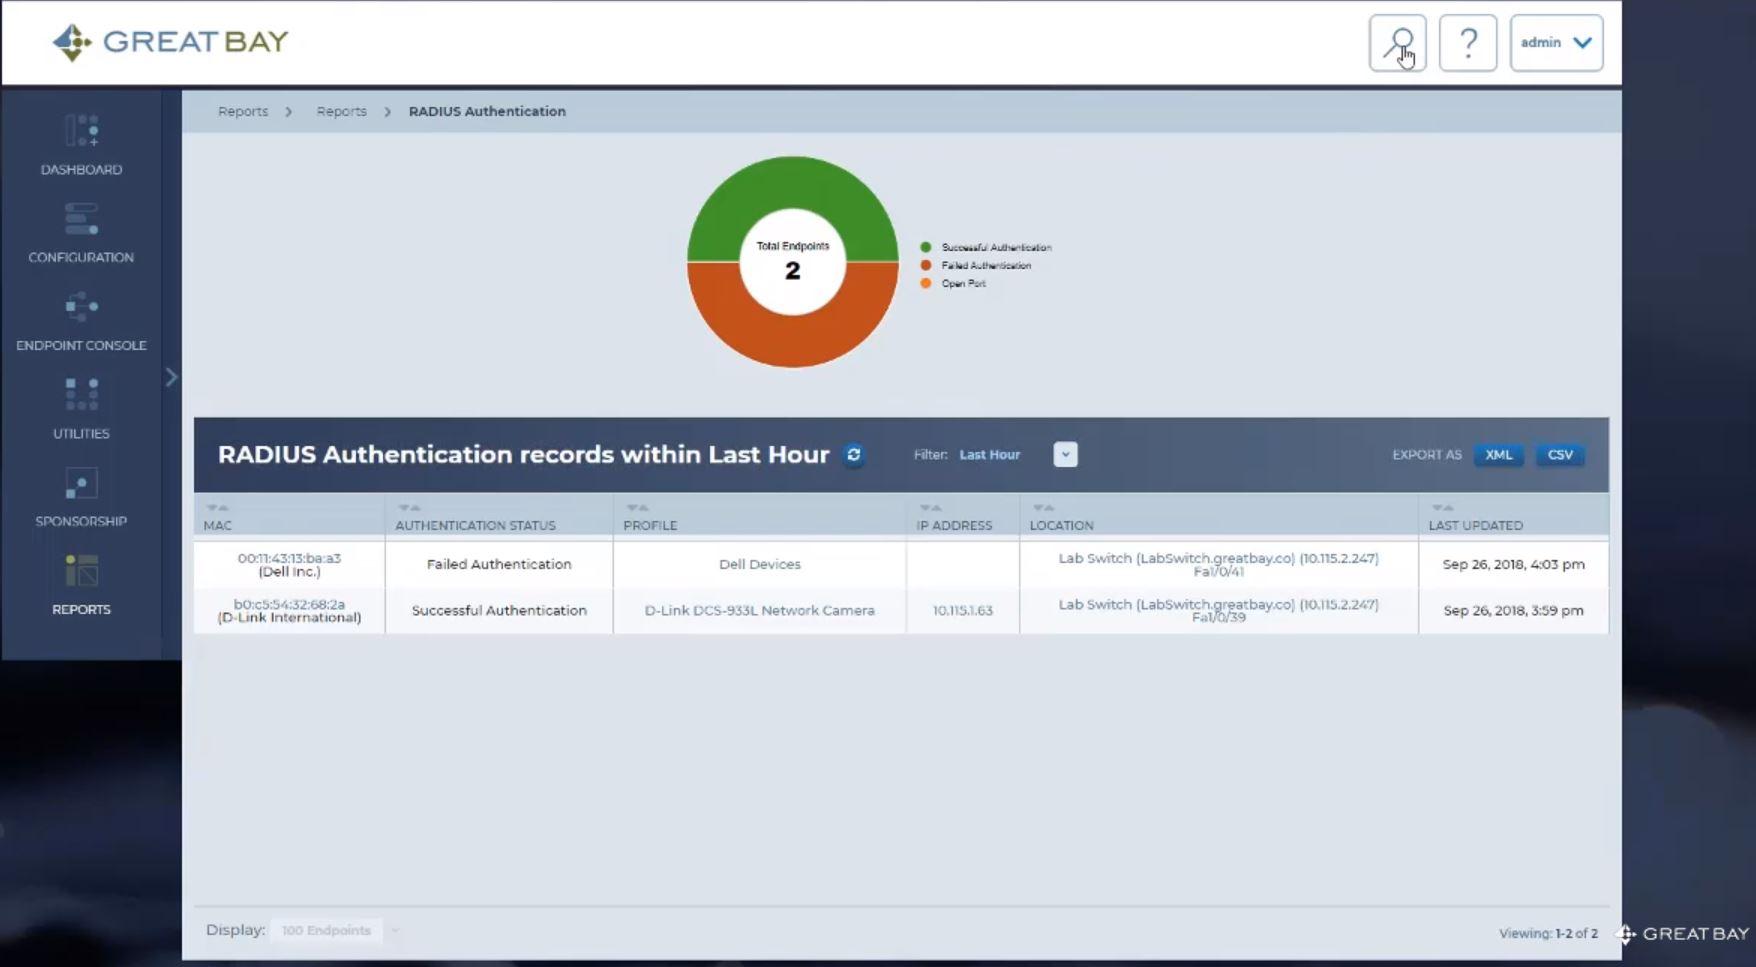 The Great Bay Network Intelligence Platform radius authentication